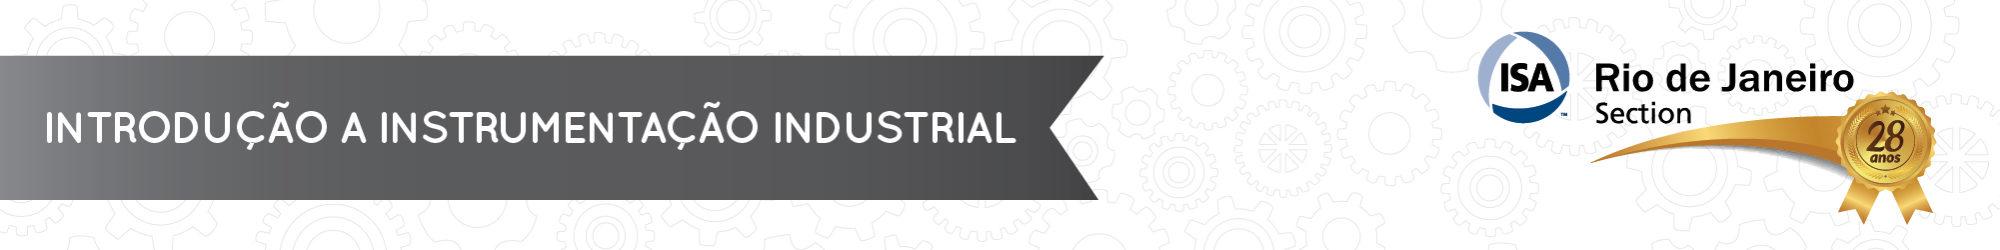 curso-introducaoainstrumentacaoindustrial-04